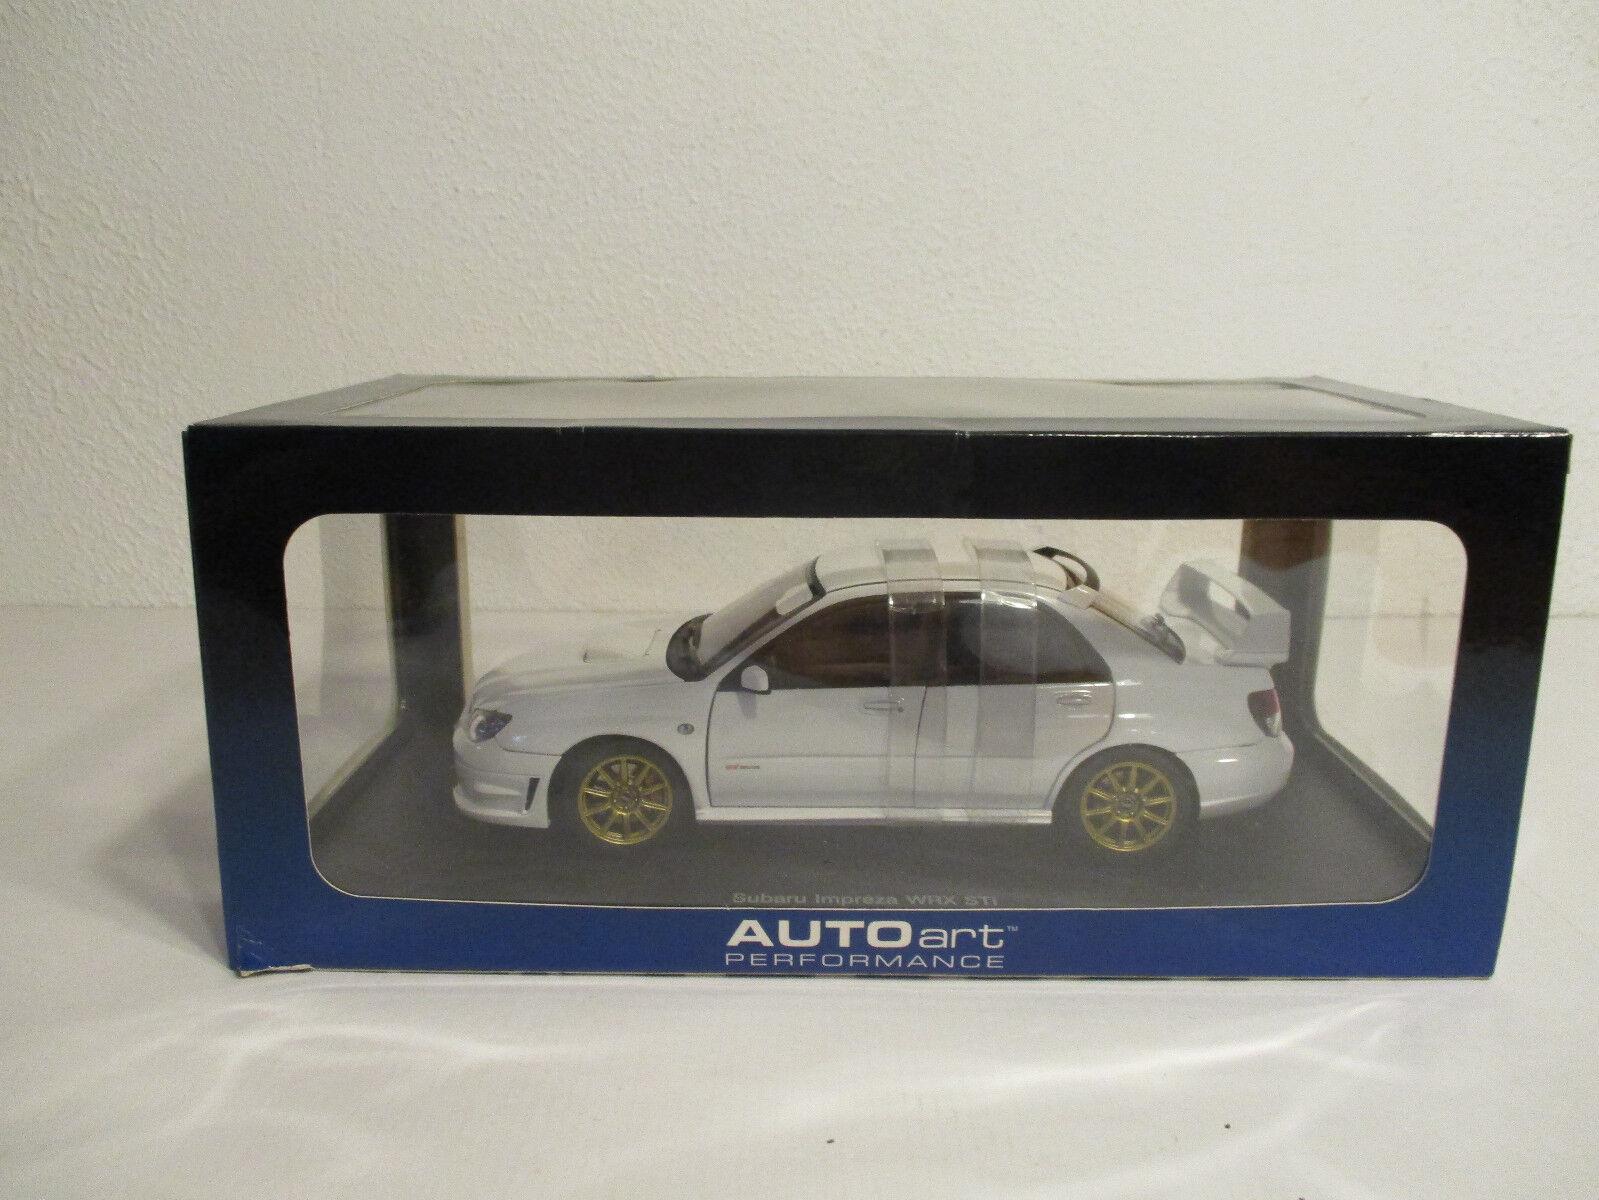 (Gok ) 1 18 Autoart Subaru Impreza Wrx Sti 2006 White Nip